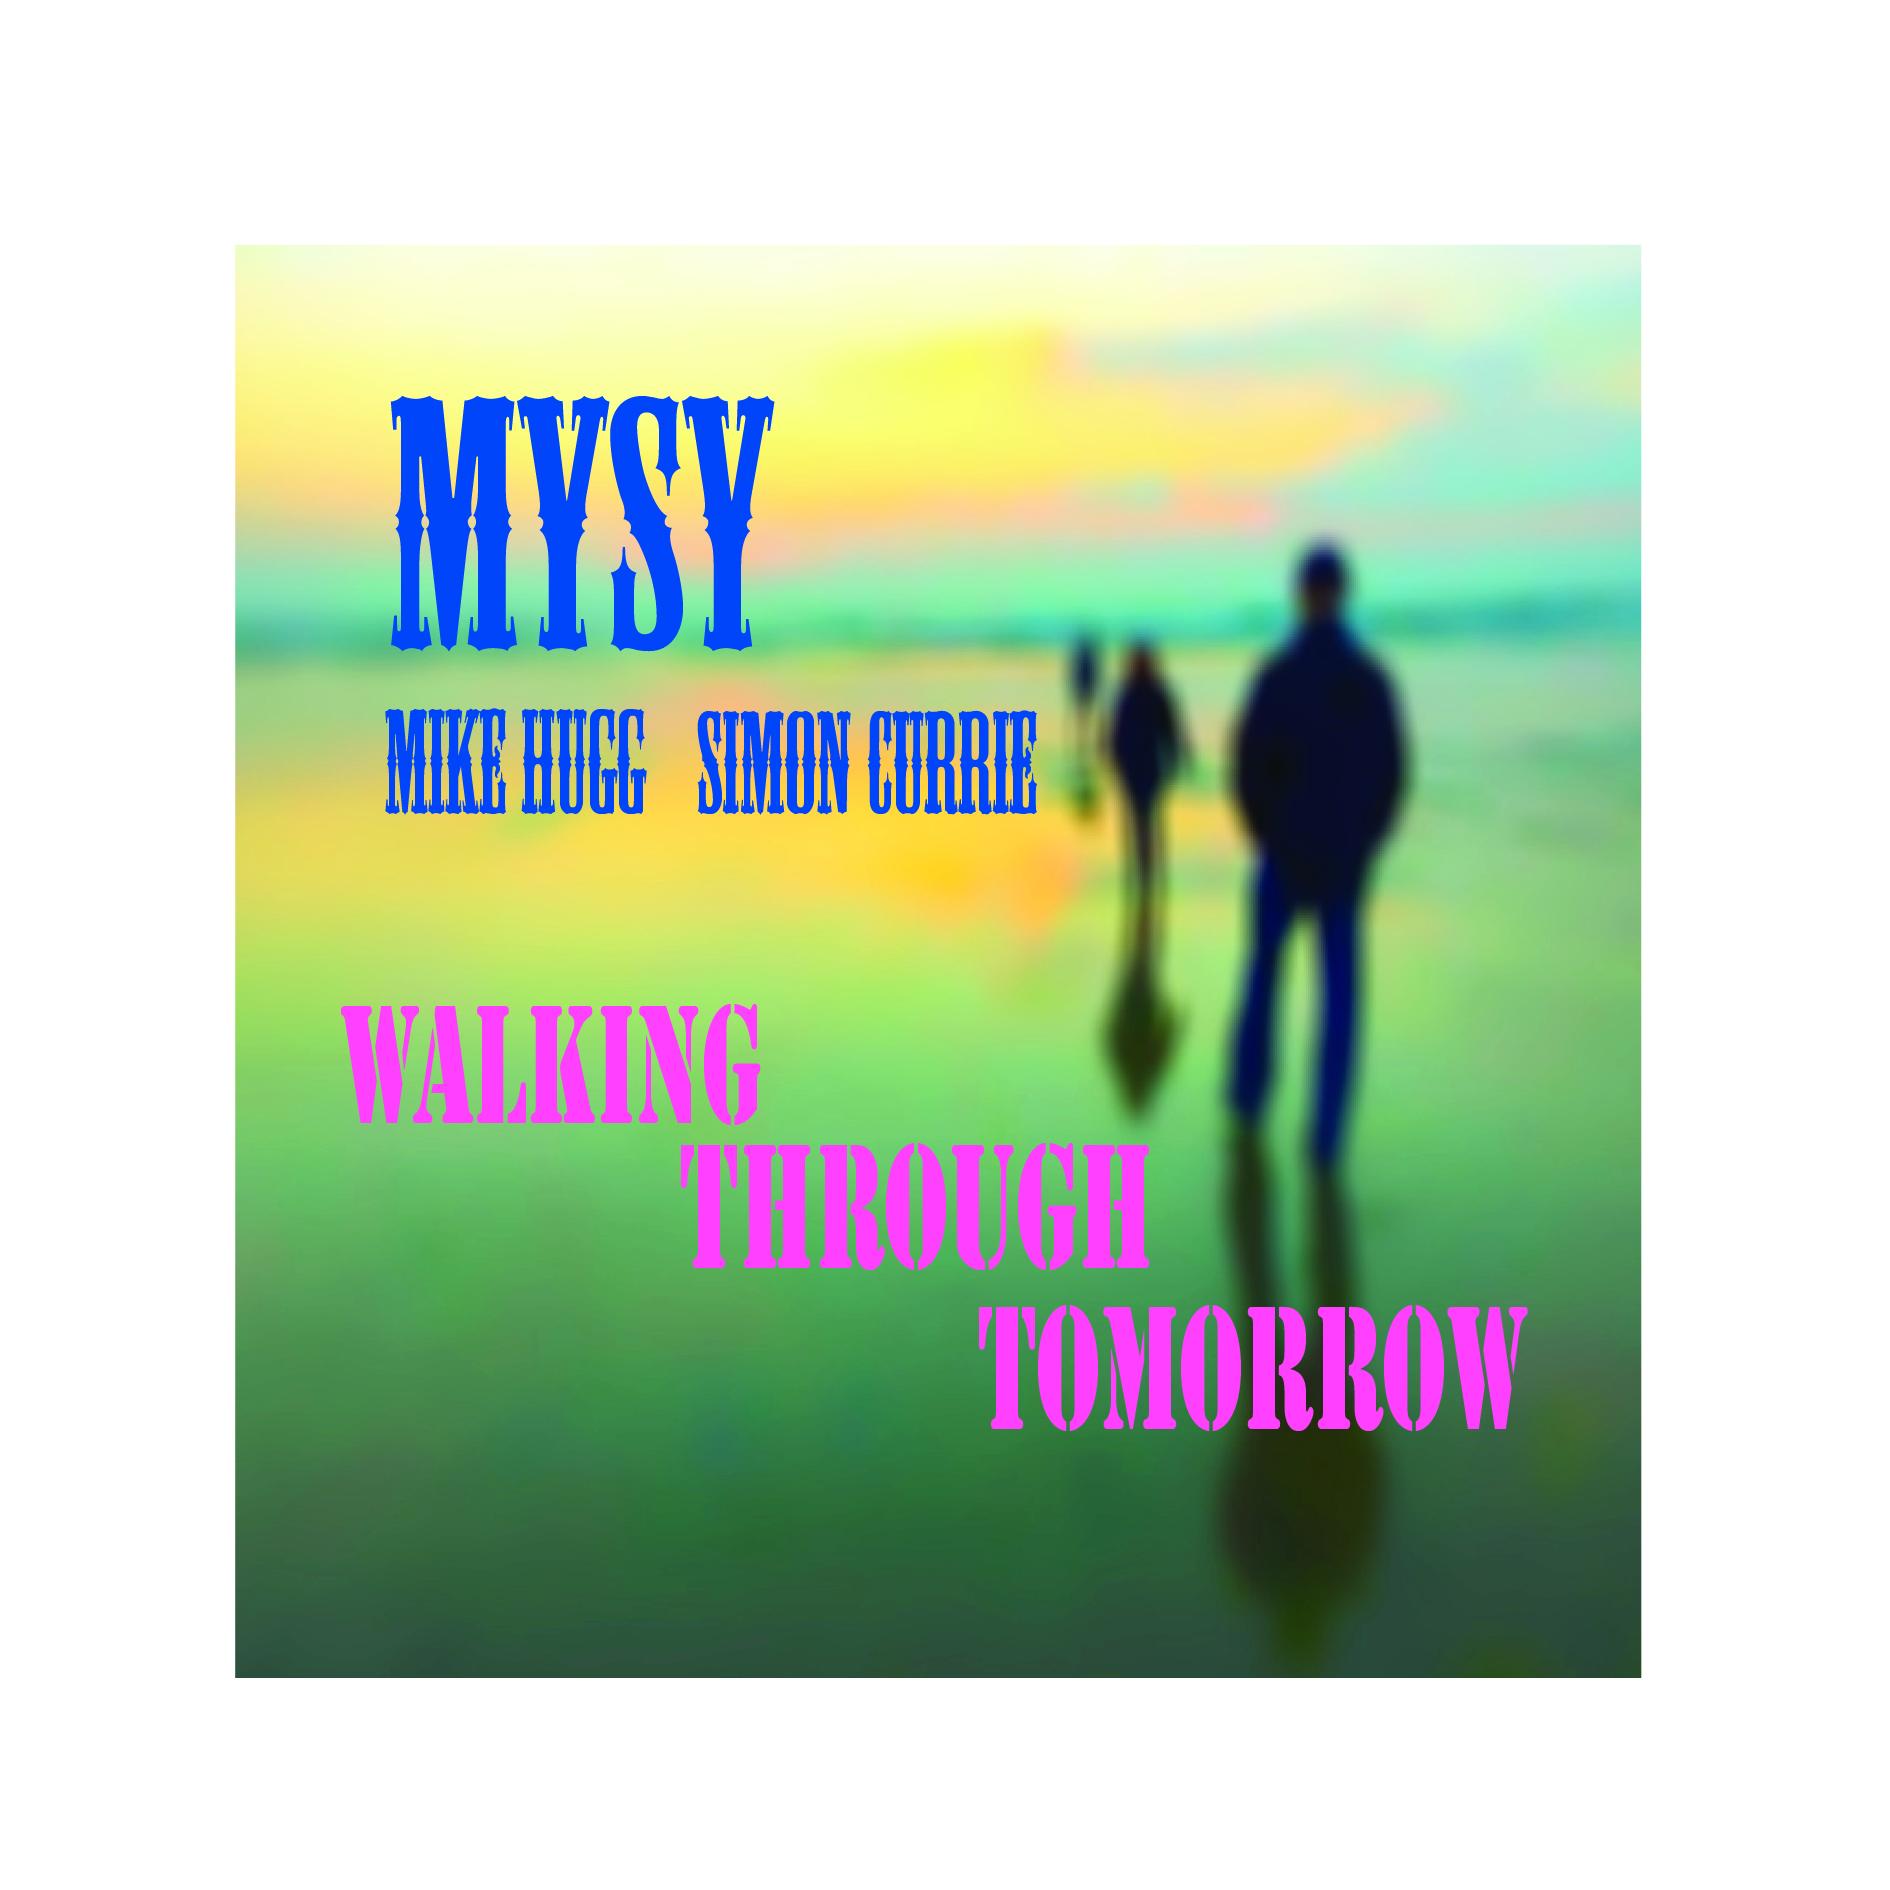 MYSY - Mike Hugg & Simon Currie \'Walking Through Tomorrow\'